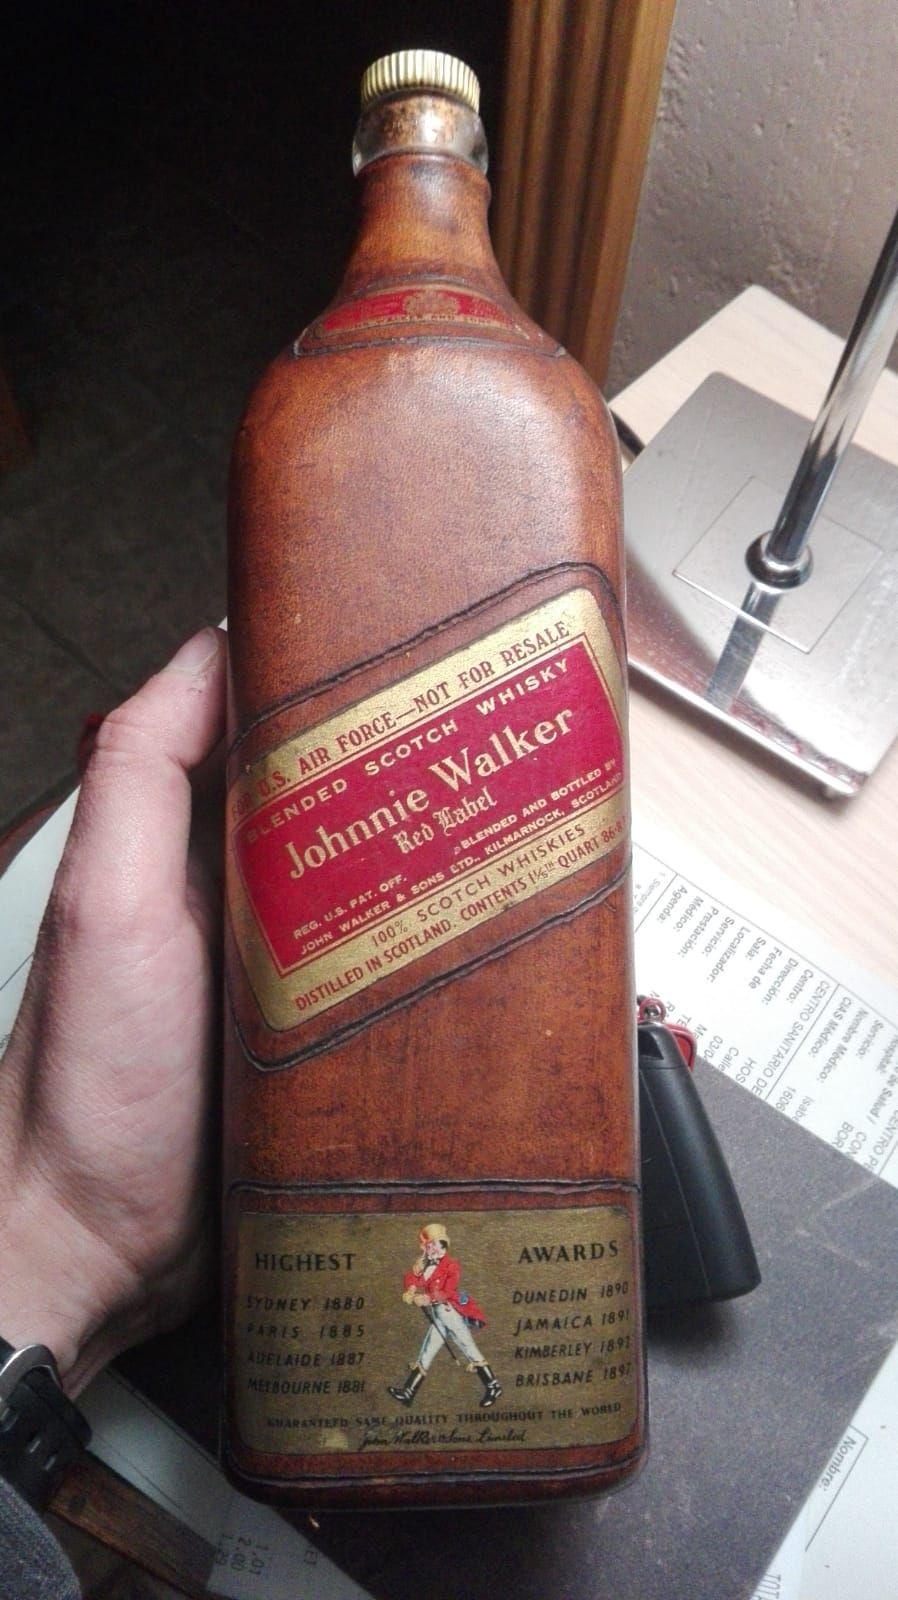 This Old Leather Bottle Https Ift Tt 2c8swja Bottle Gold Peak Tea Bottle Tea Bottle